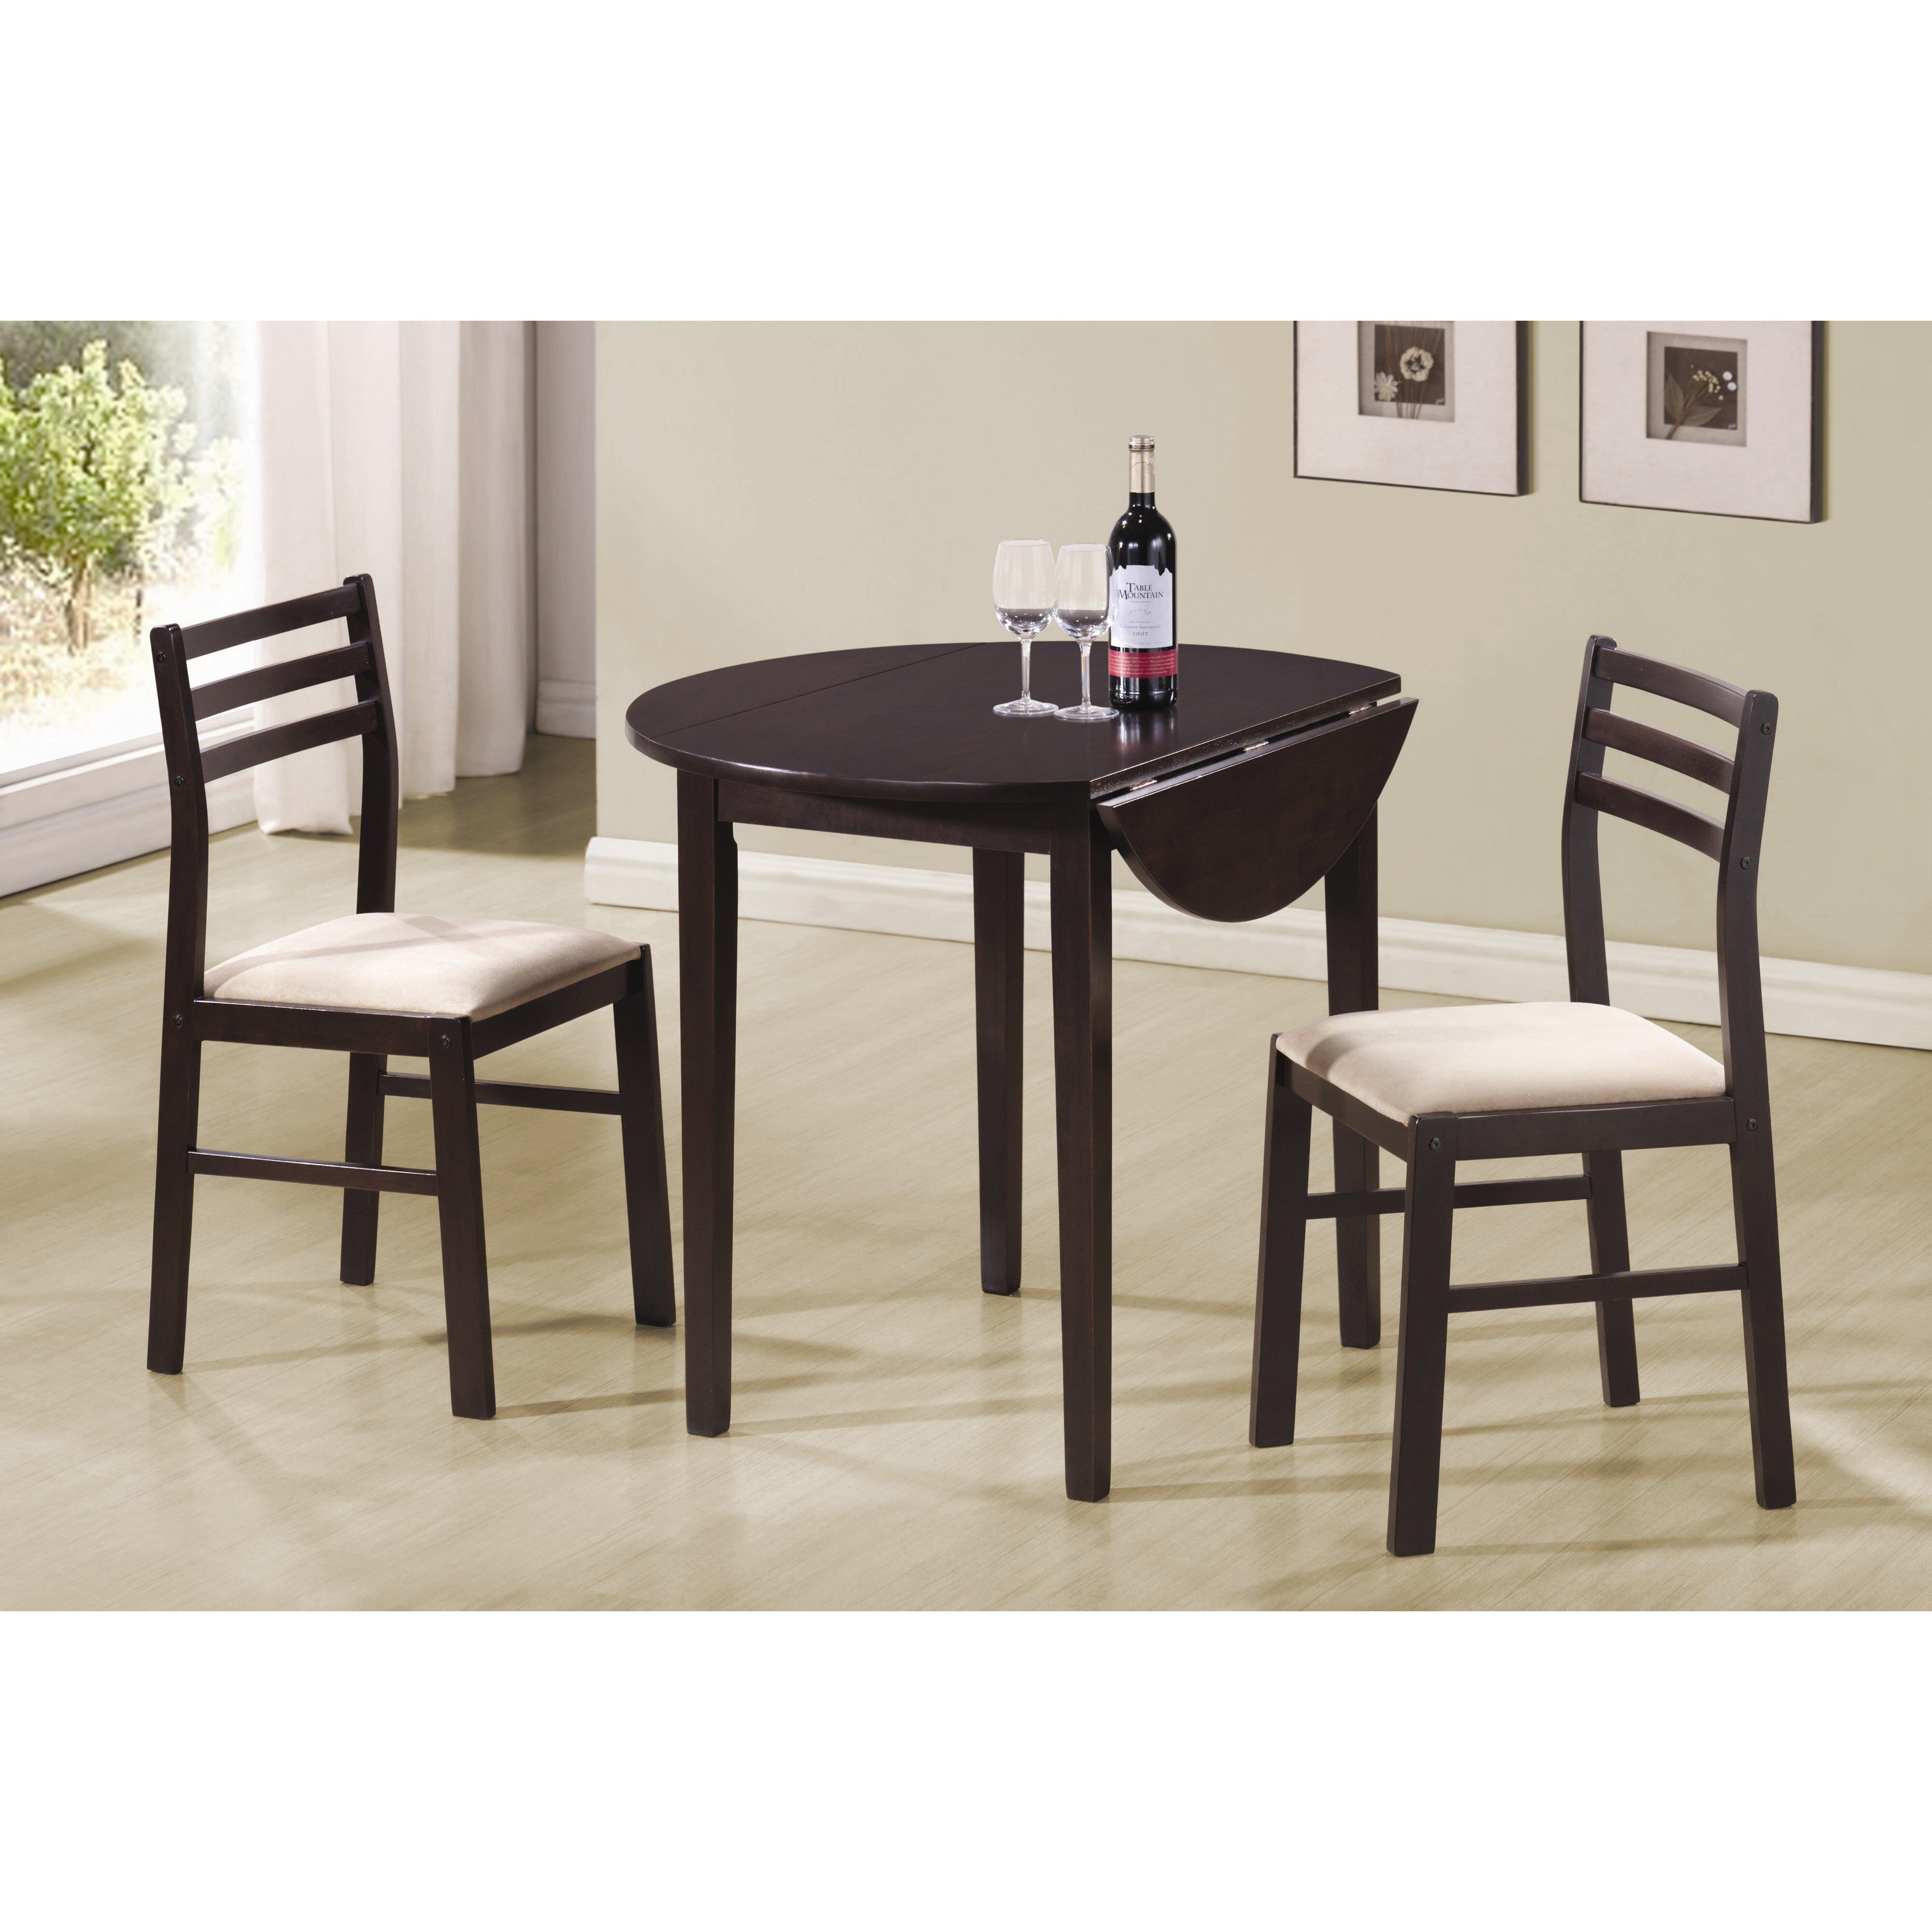 andover mills lynbrook 3 piece dining set reviews wayfair. Black Bedroom Furniture Sets. Home Design Ideas